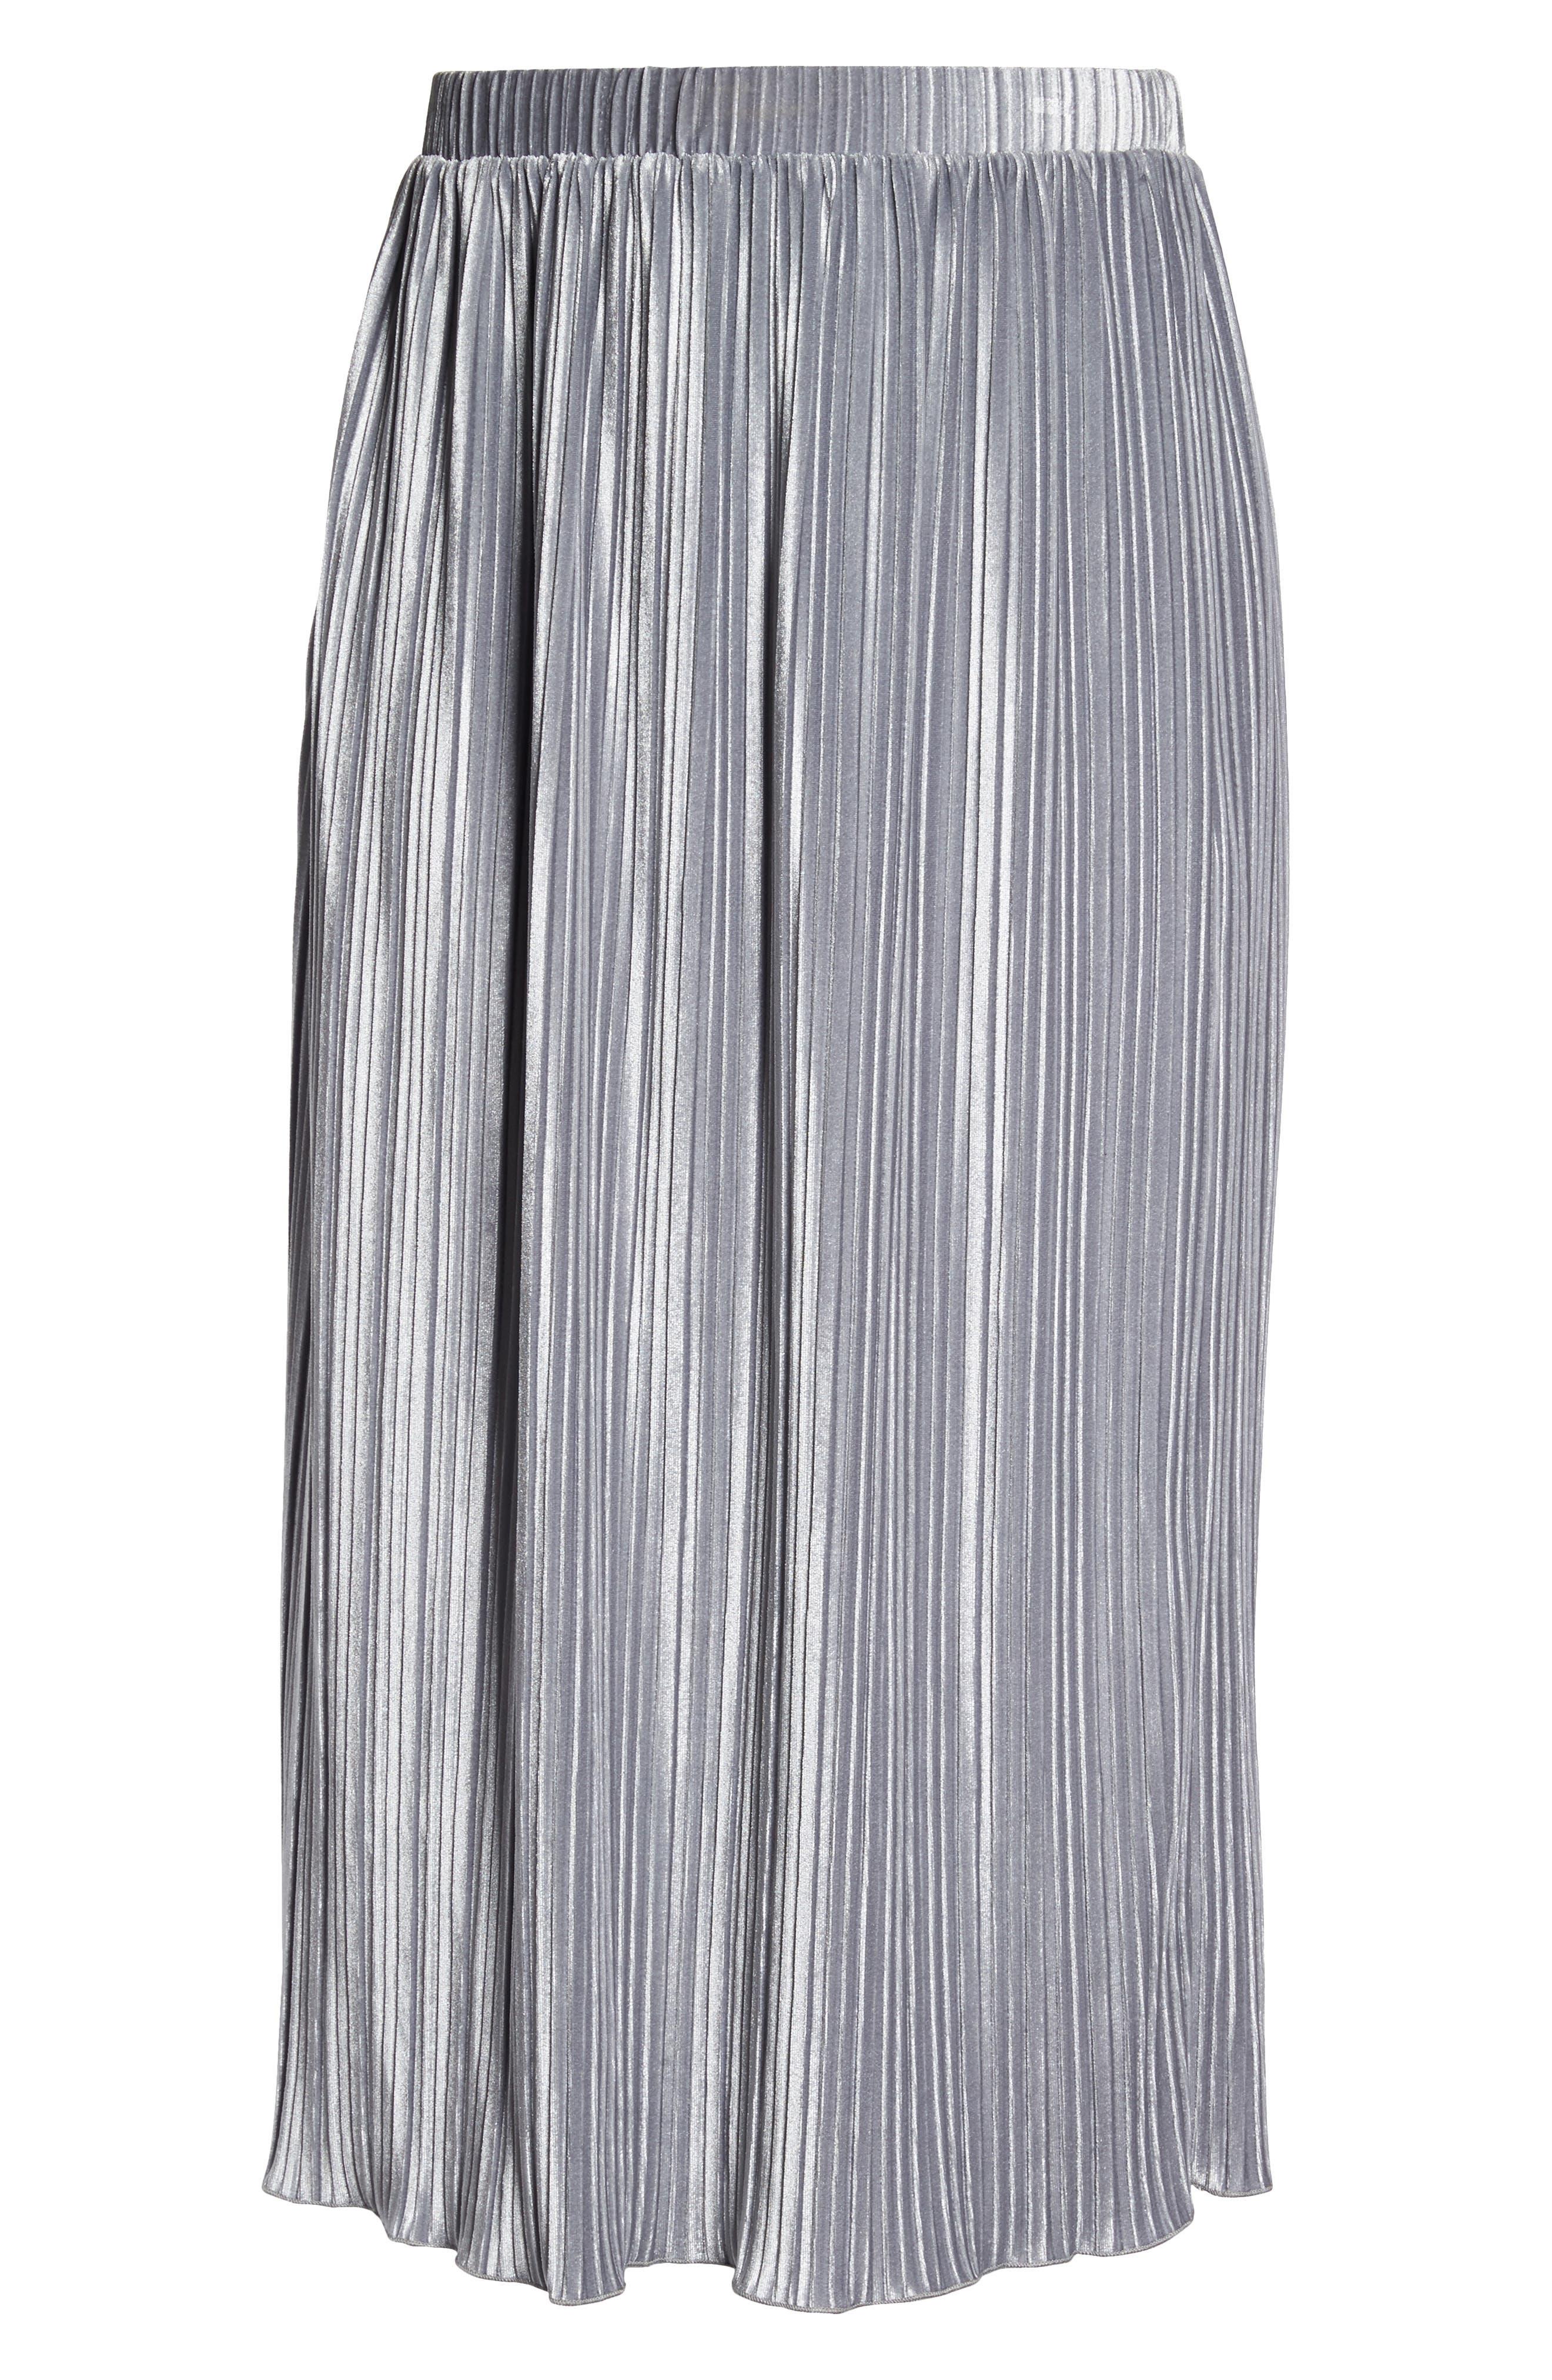 Pleat Velour Midi Skirt,                             Alternate thumbnail 6, color,                             030